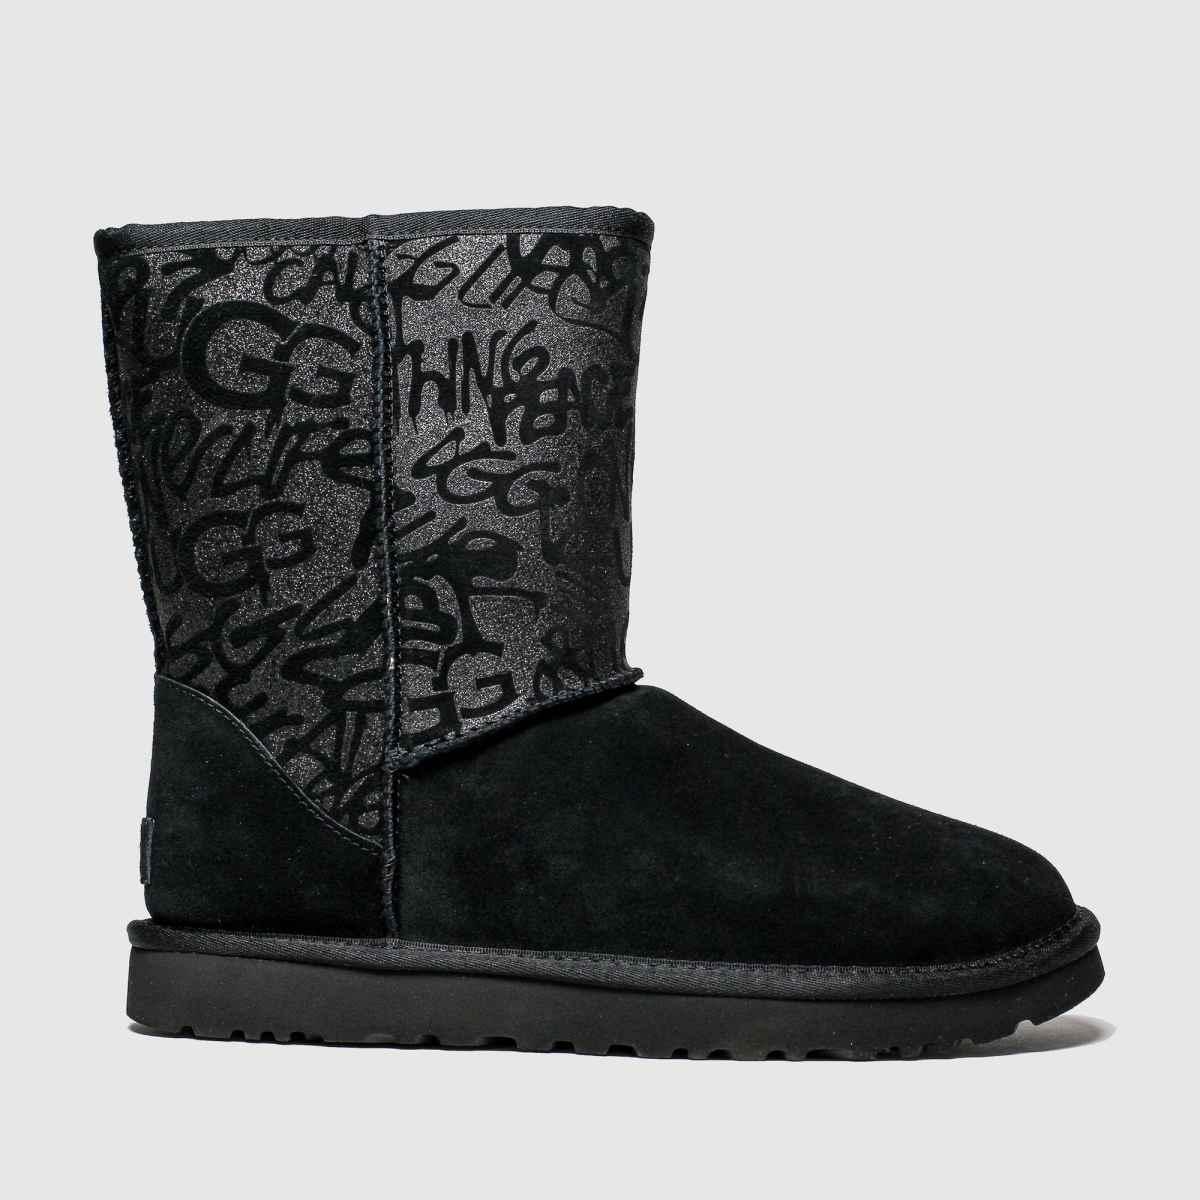 Ugg Black Classic Short Sparkle Graffiti Boots